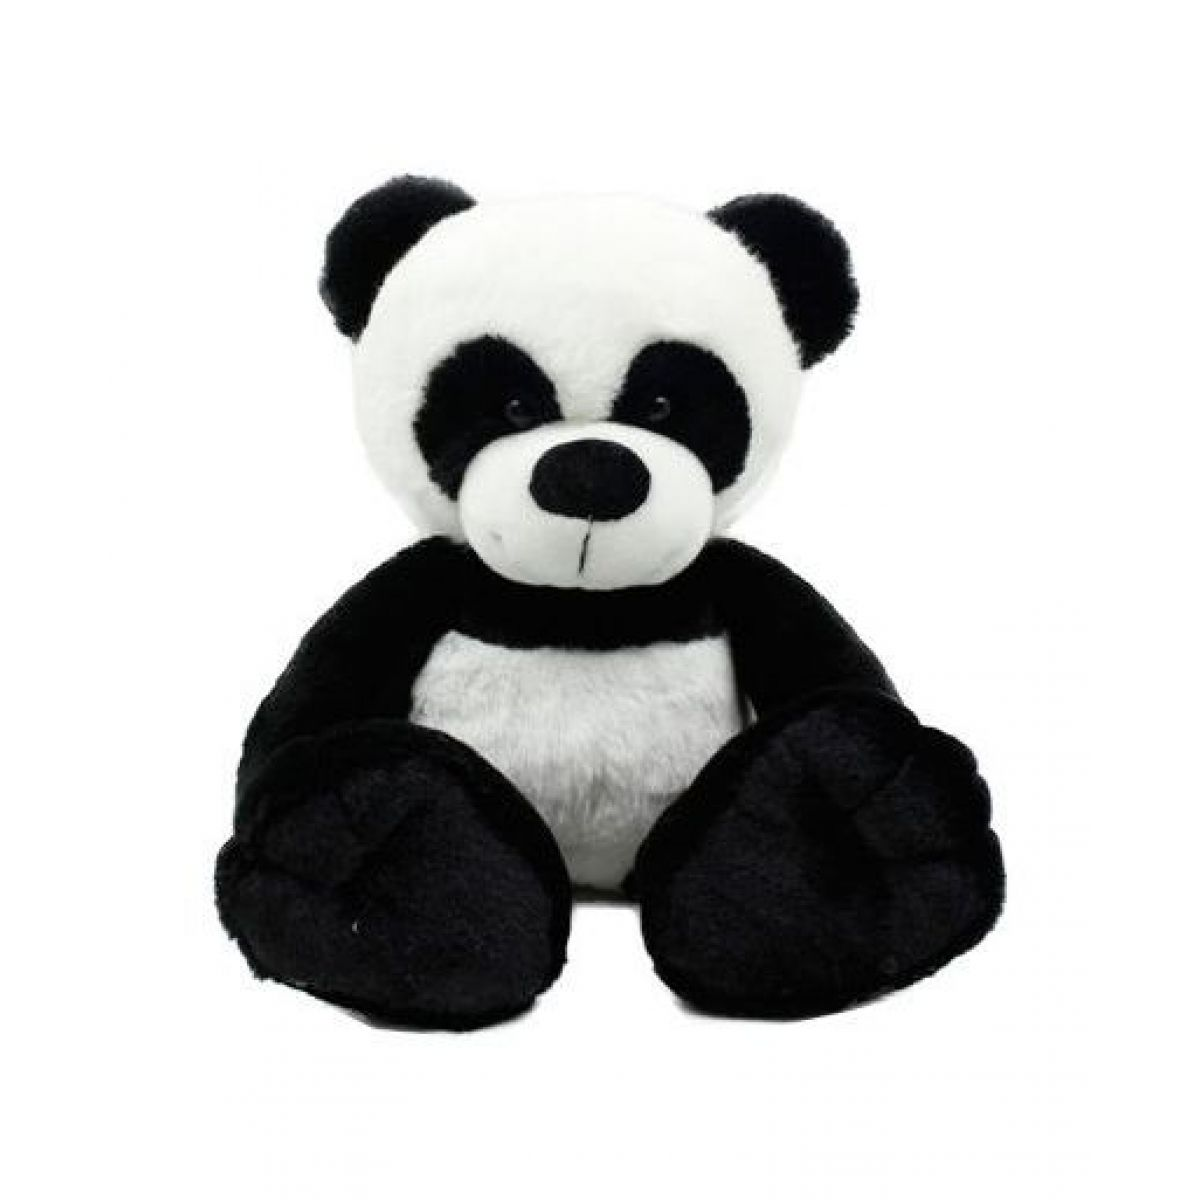 Plyšové zvířátko Panda 25cm